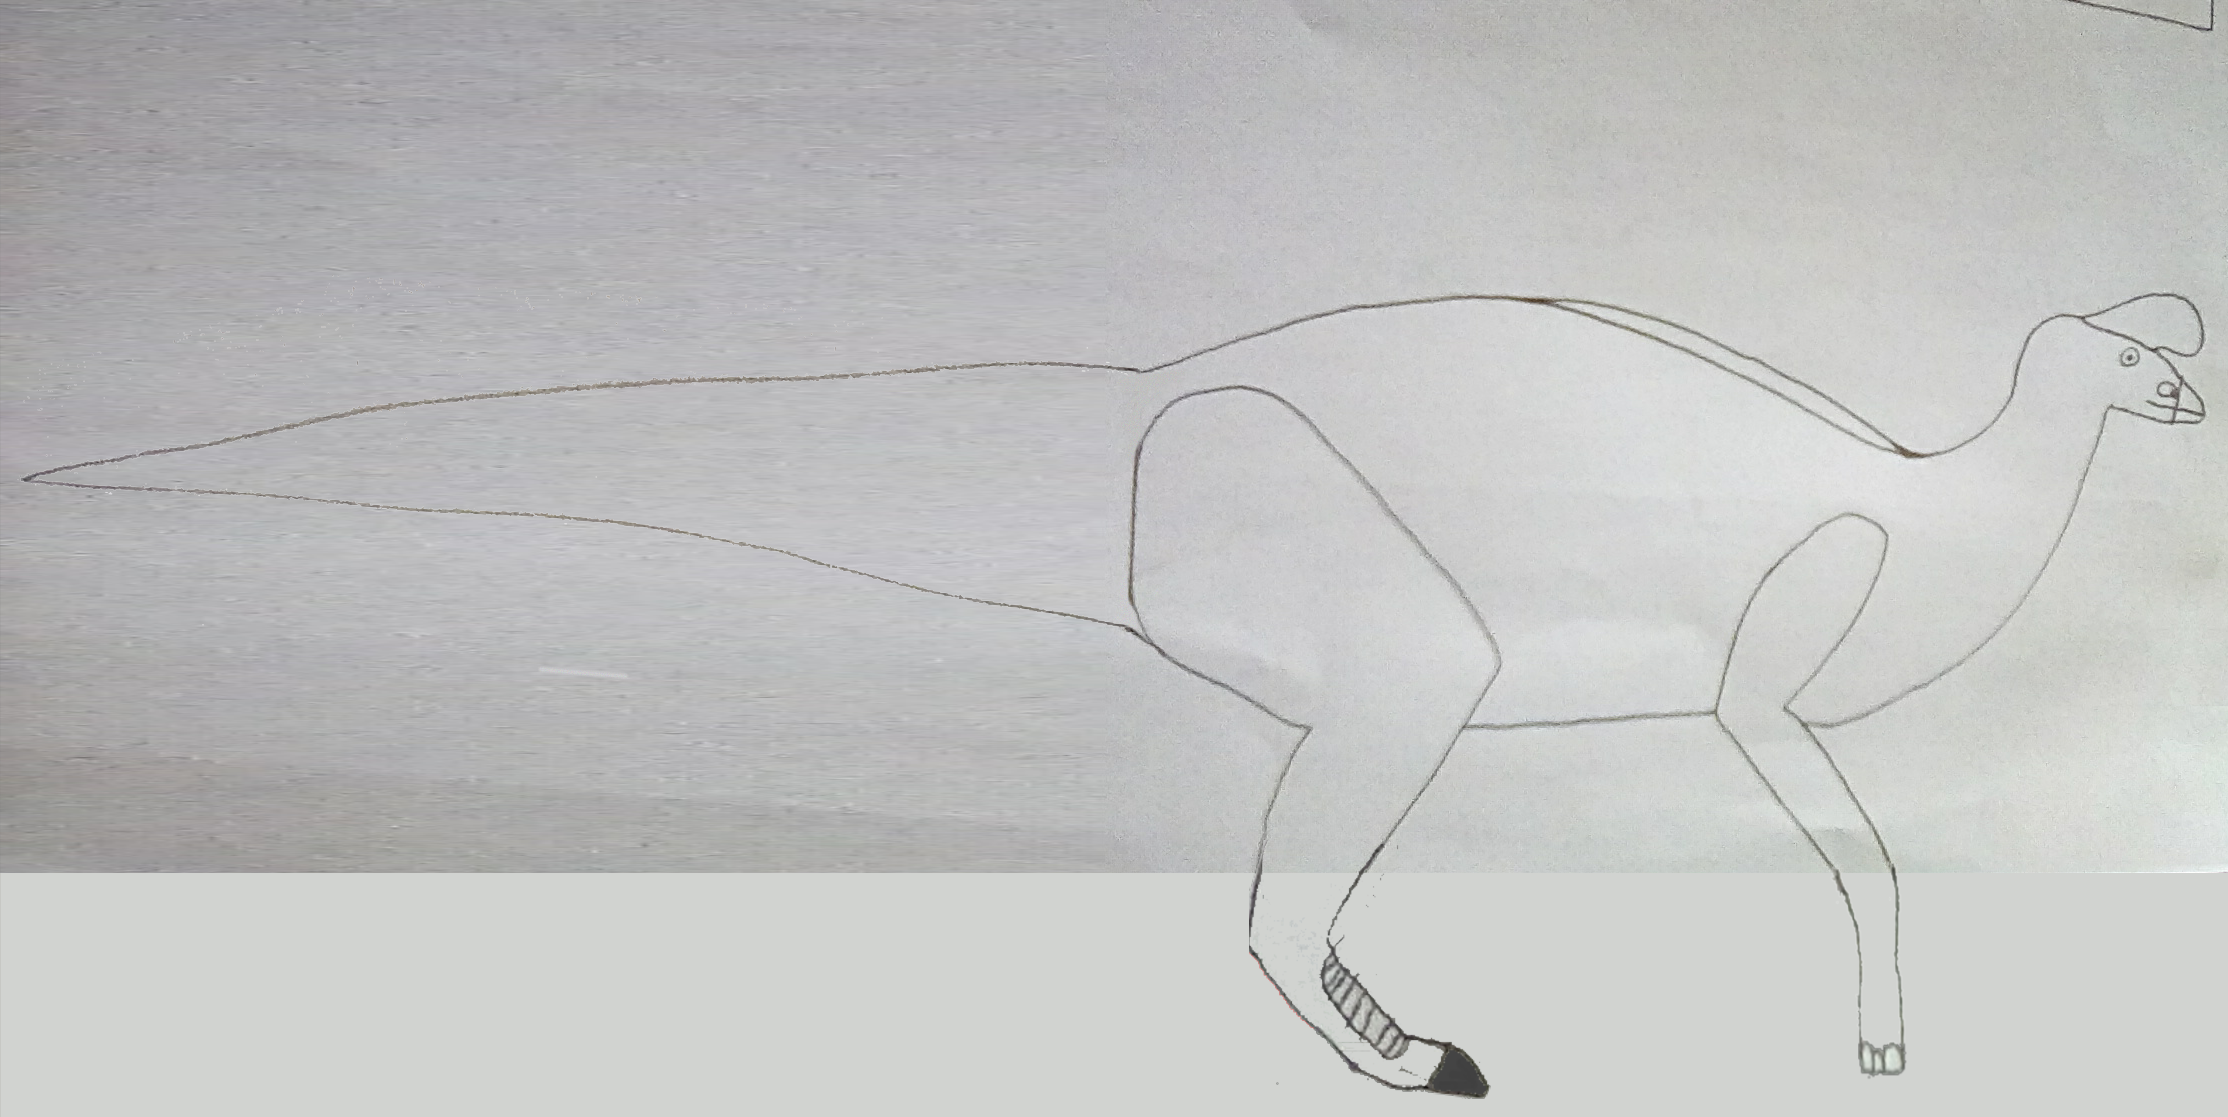 Donnosaurus